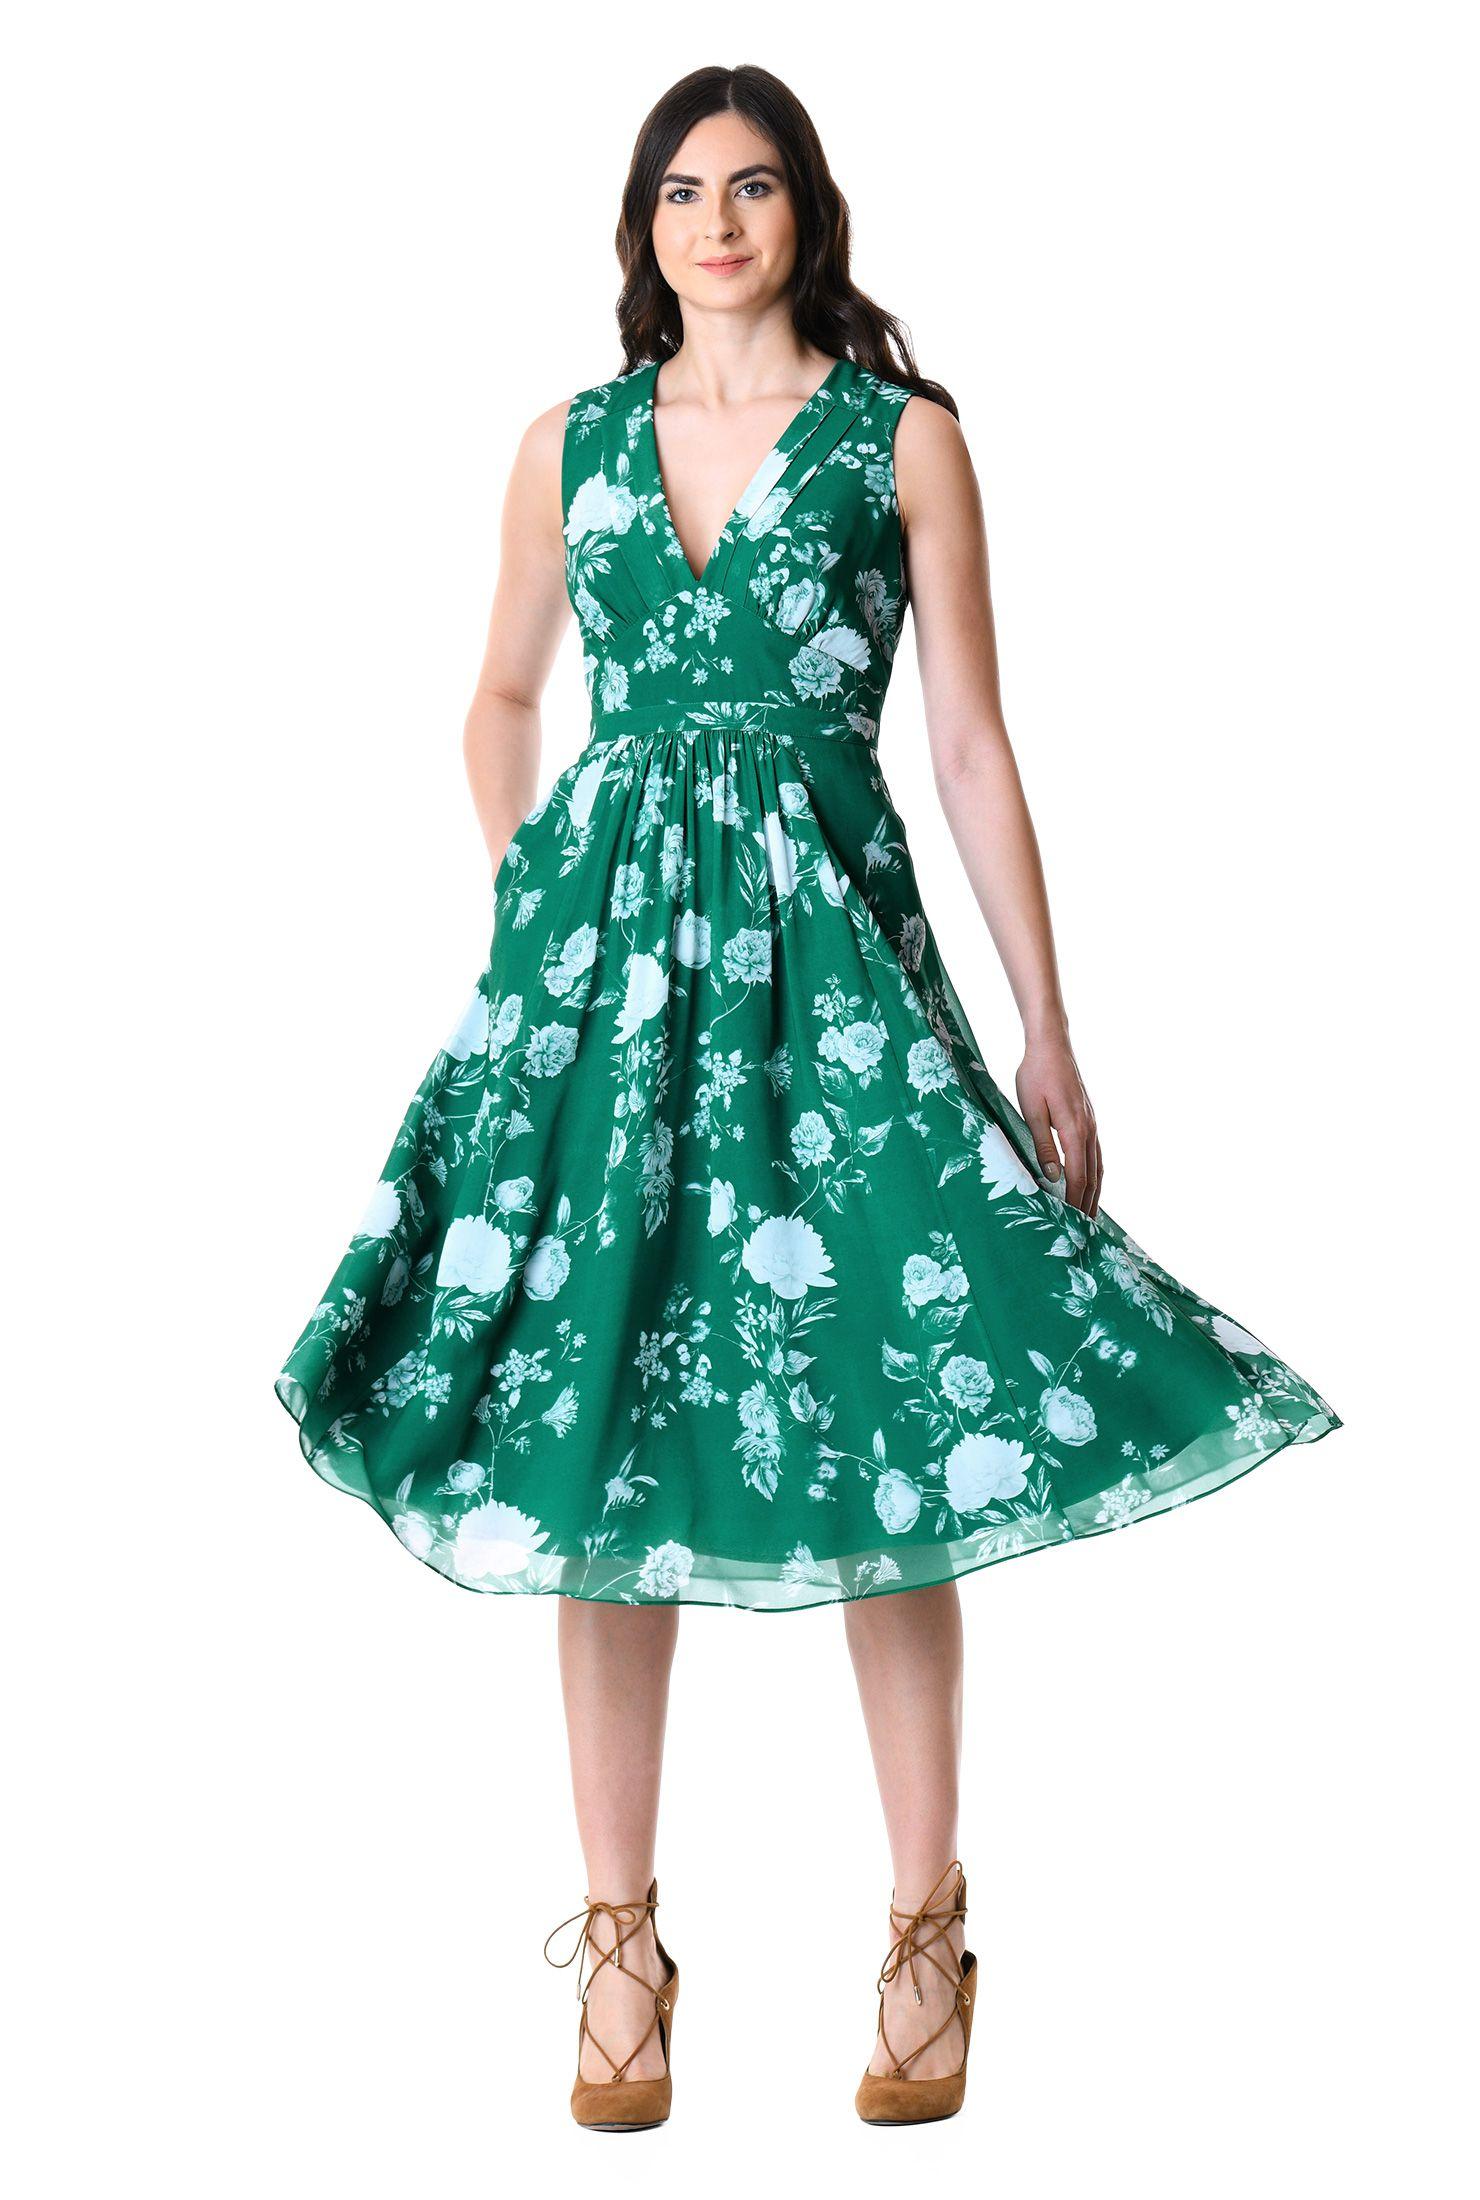 Designer womenus fashion dresses evening dresses little black